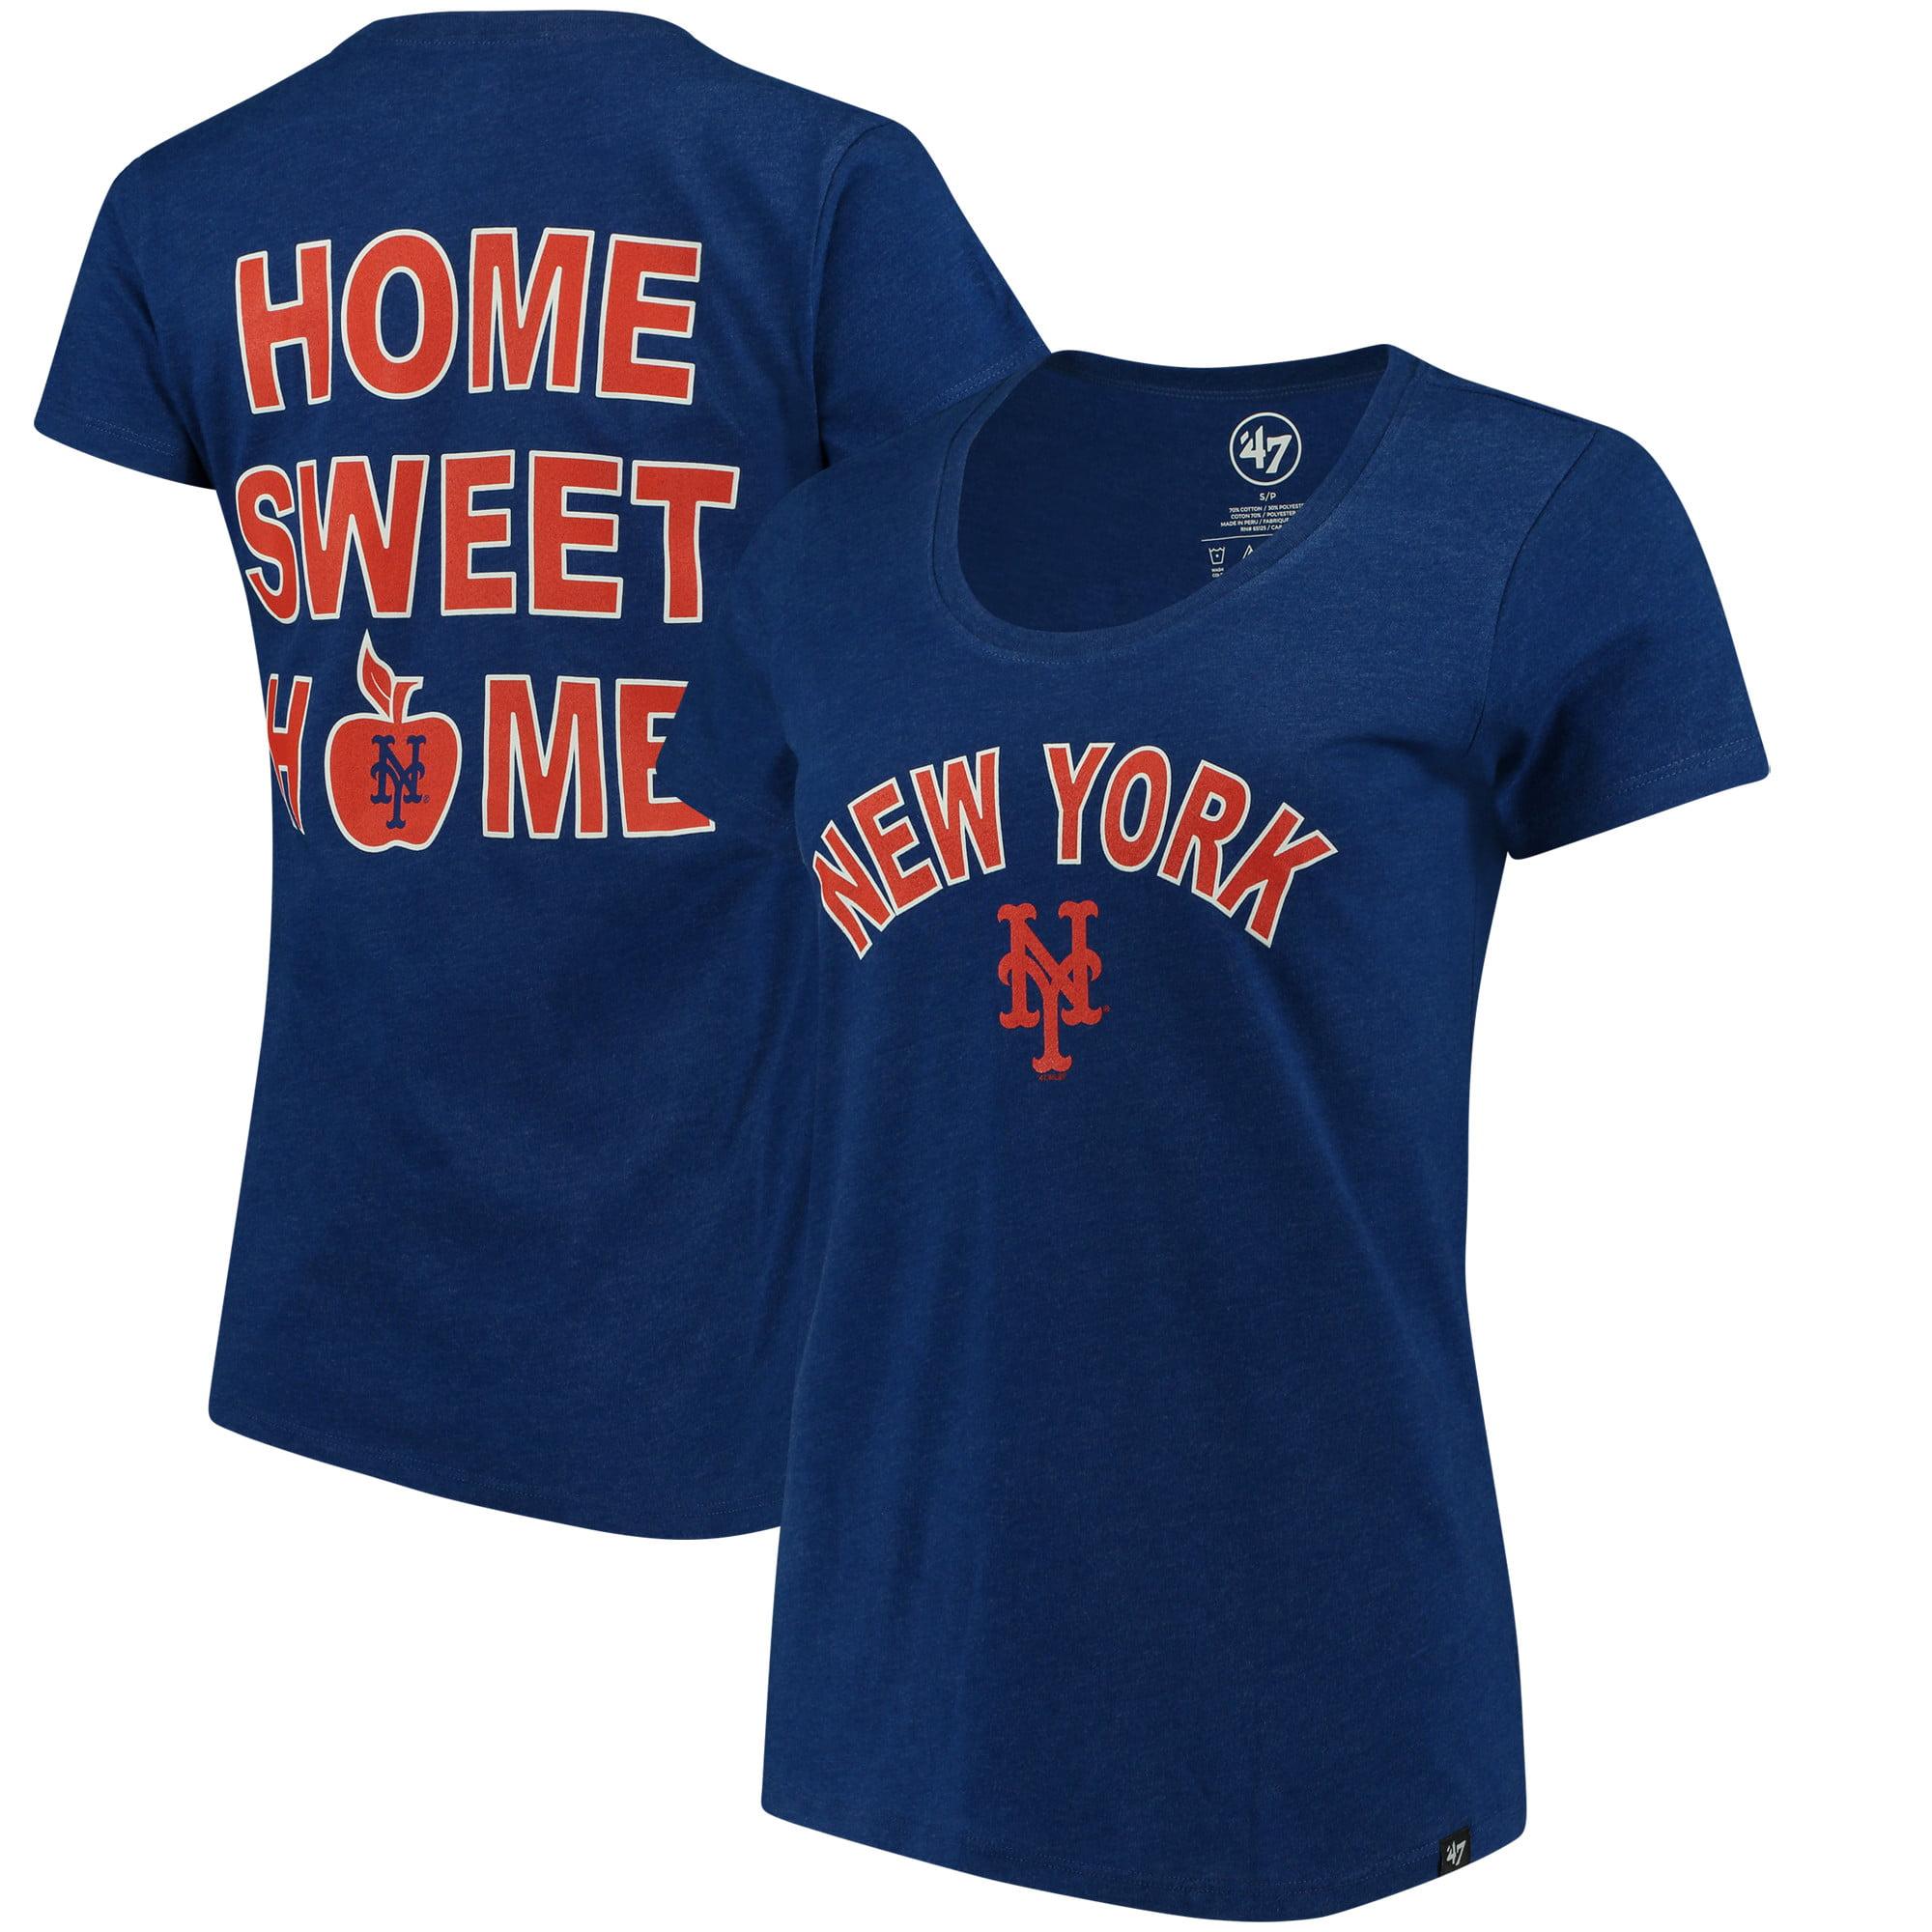 New York Mets '47 Women's Club Scoop Neck T-Shirt - Royal